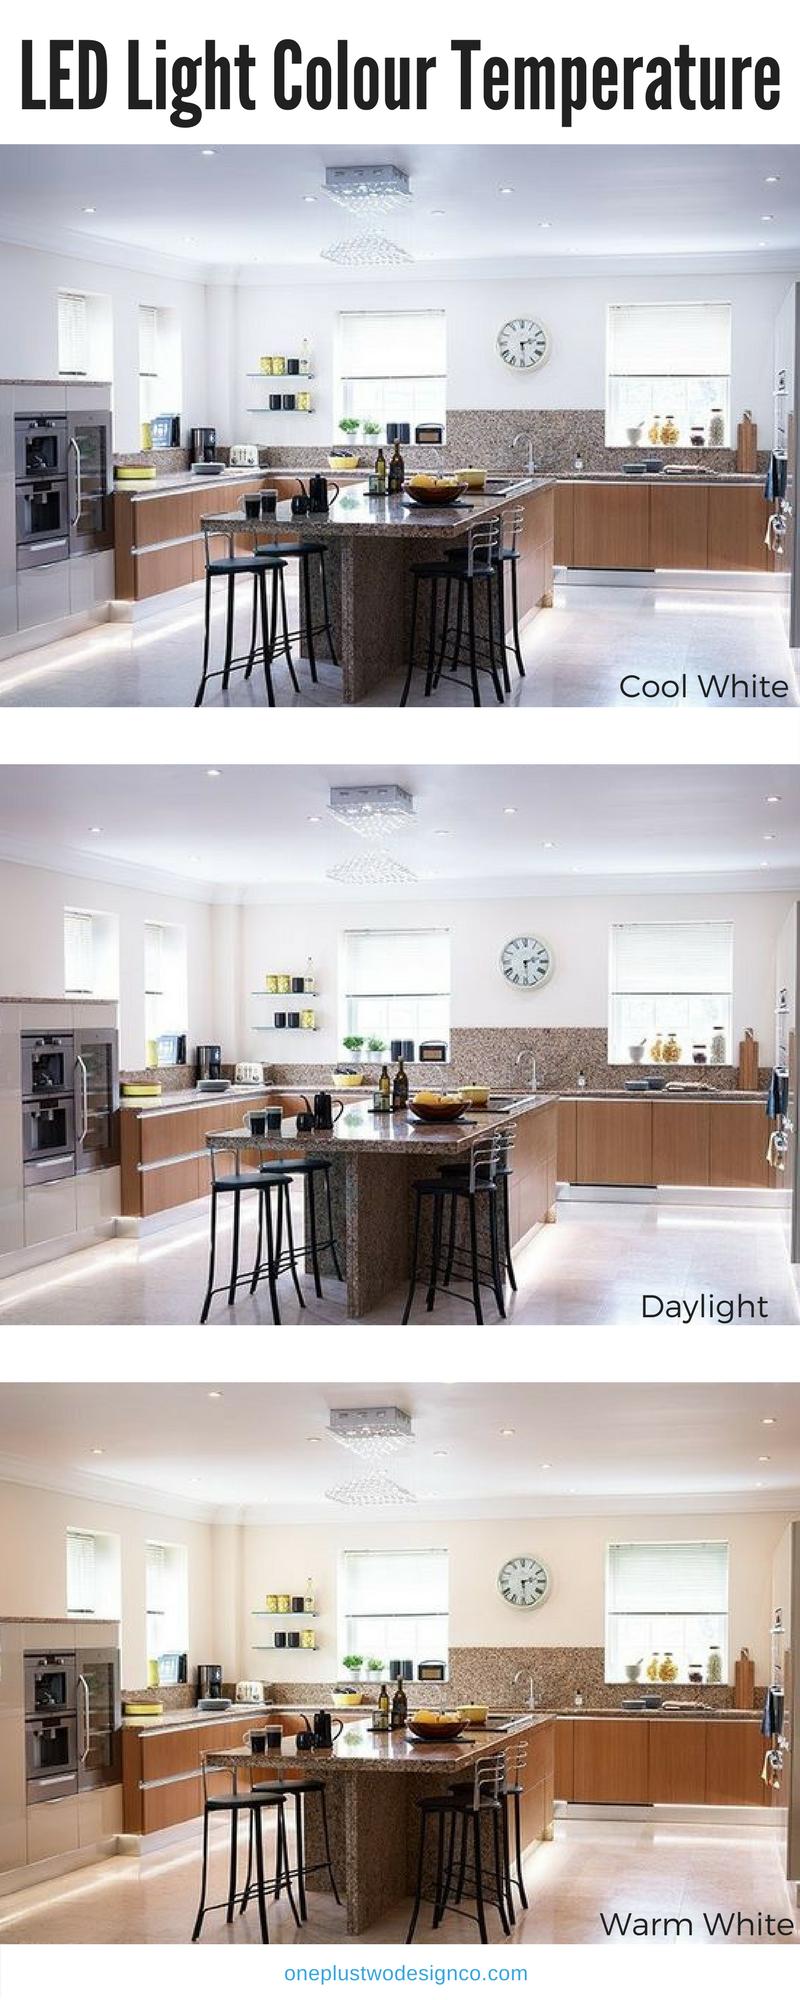 Warm Light Vs Daylight : light, daylight, Choose, Right, Light, Colour, Temperature, Oneplustwo, Design, Interior, Decorating, Kitchen, Colors,, Lighting,, Lighting